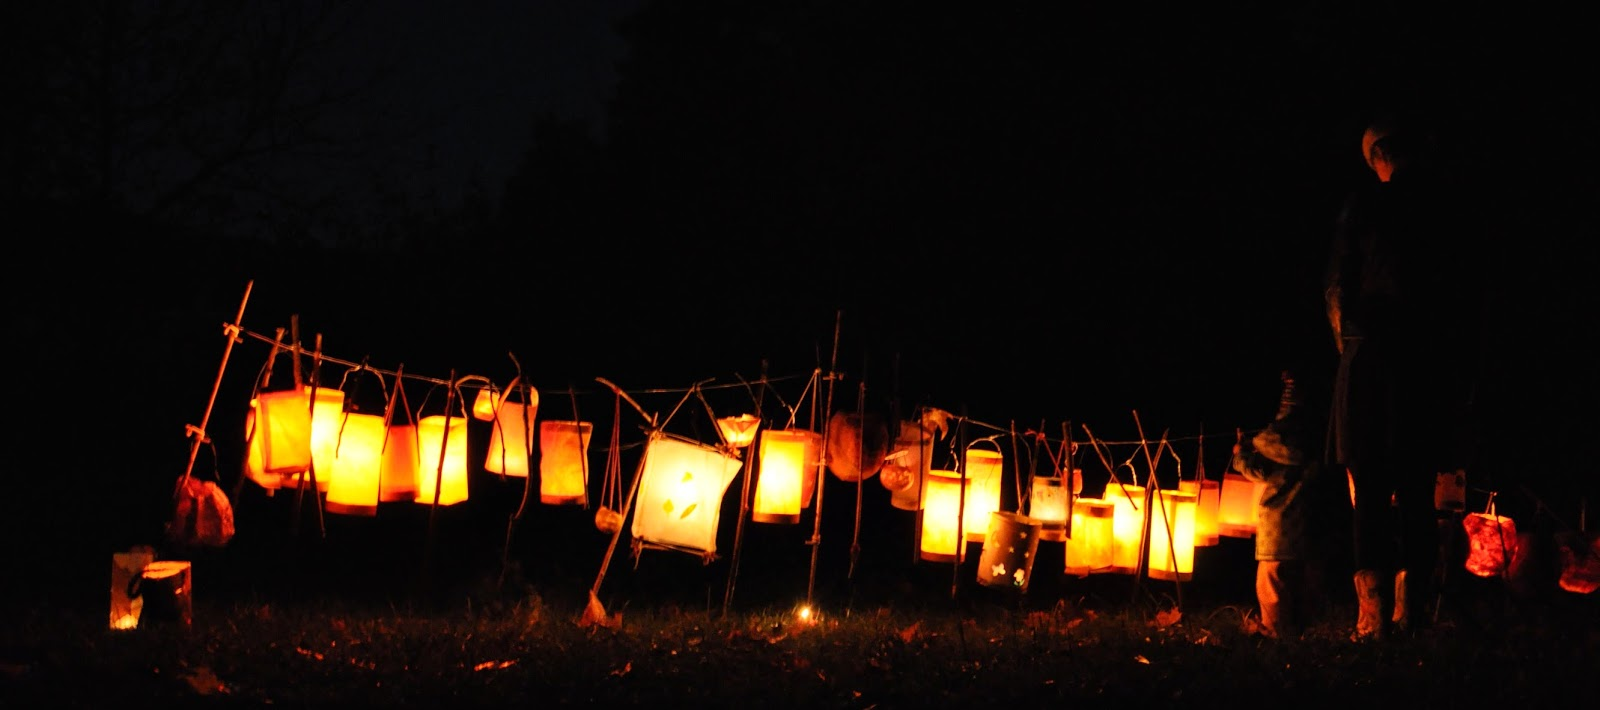 lanterns of st. martin